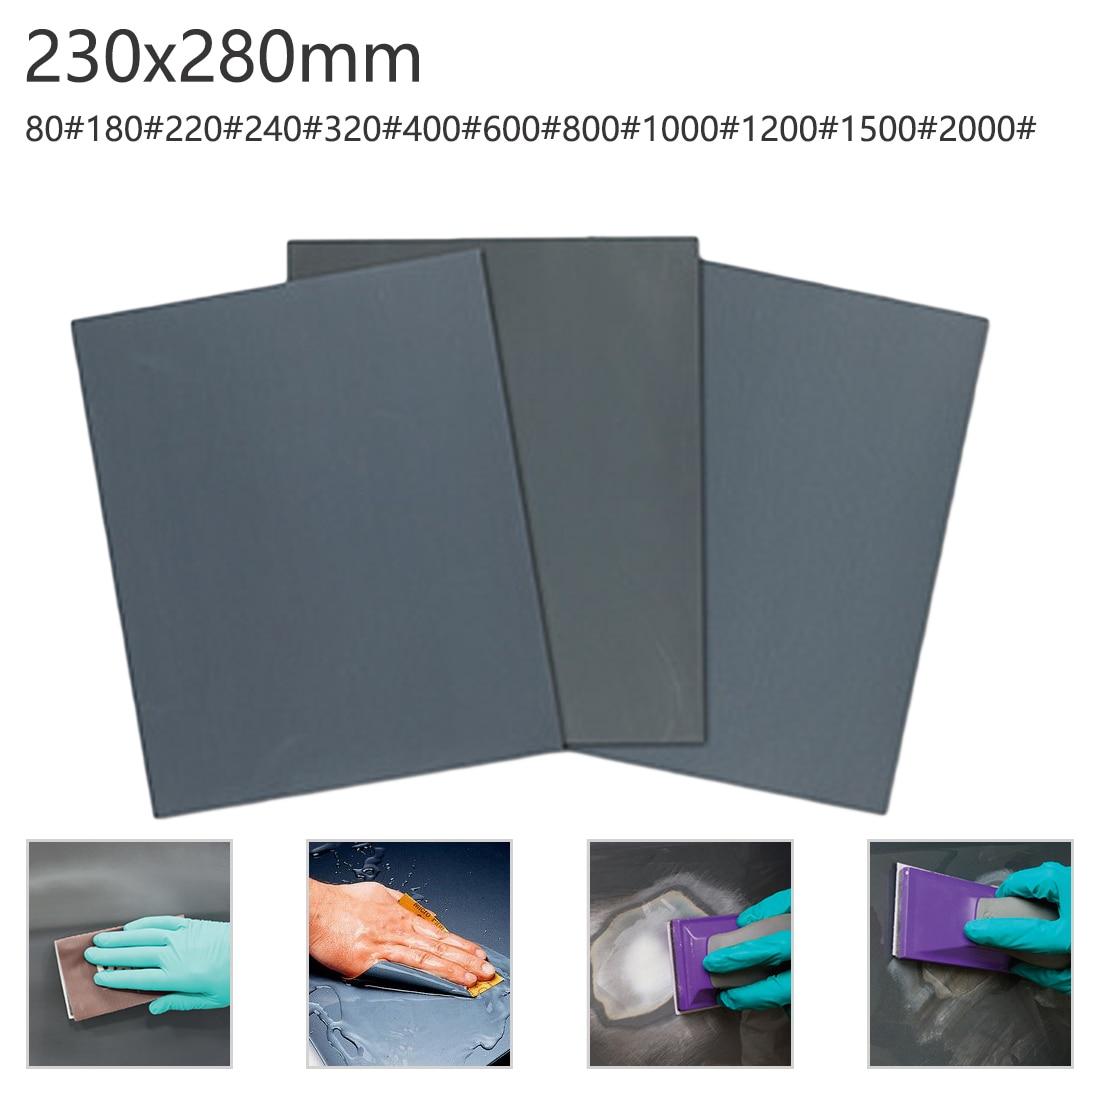 Weiler 69873 Tiger Ceramic Alumina Resin Fiber Sanding /& Grinding Disc 7//8 Arbor Hole, 50 Grit Pack of 25 9 Diameter